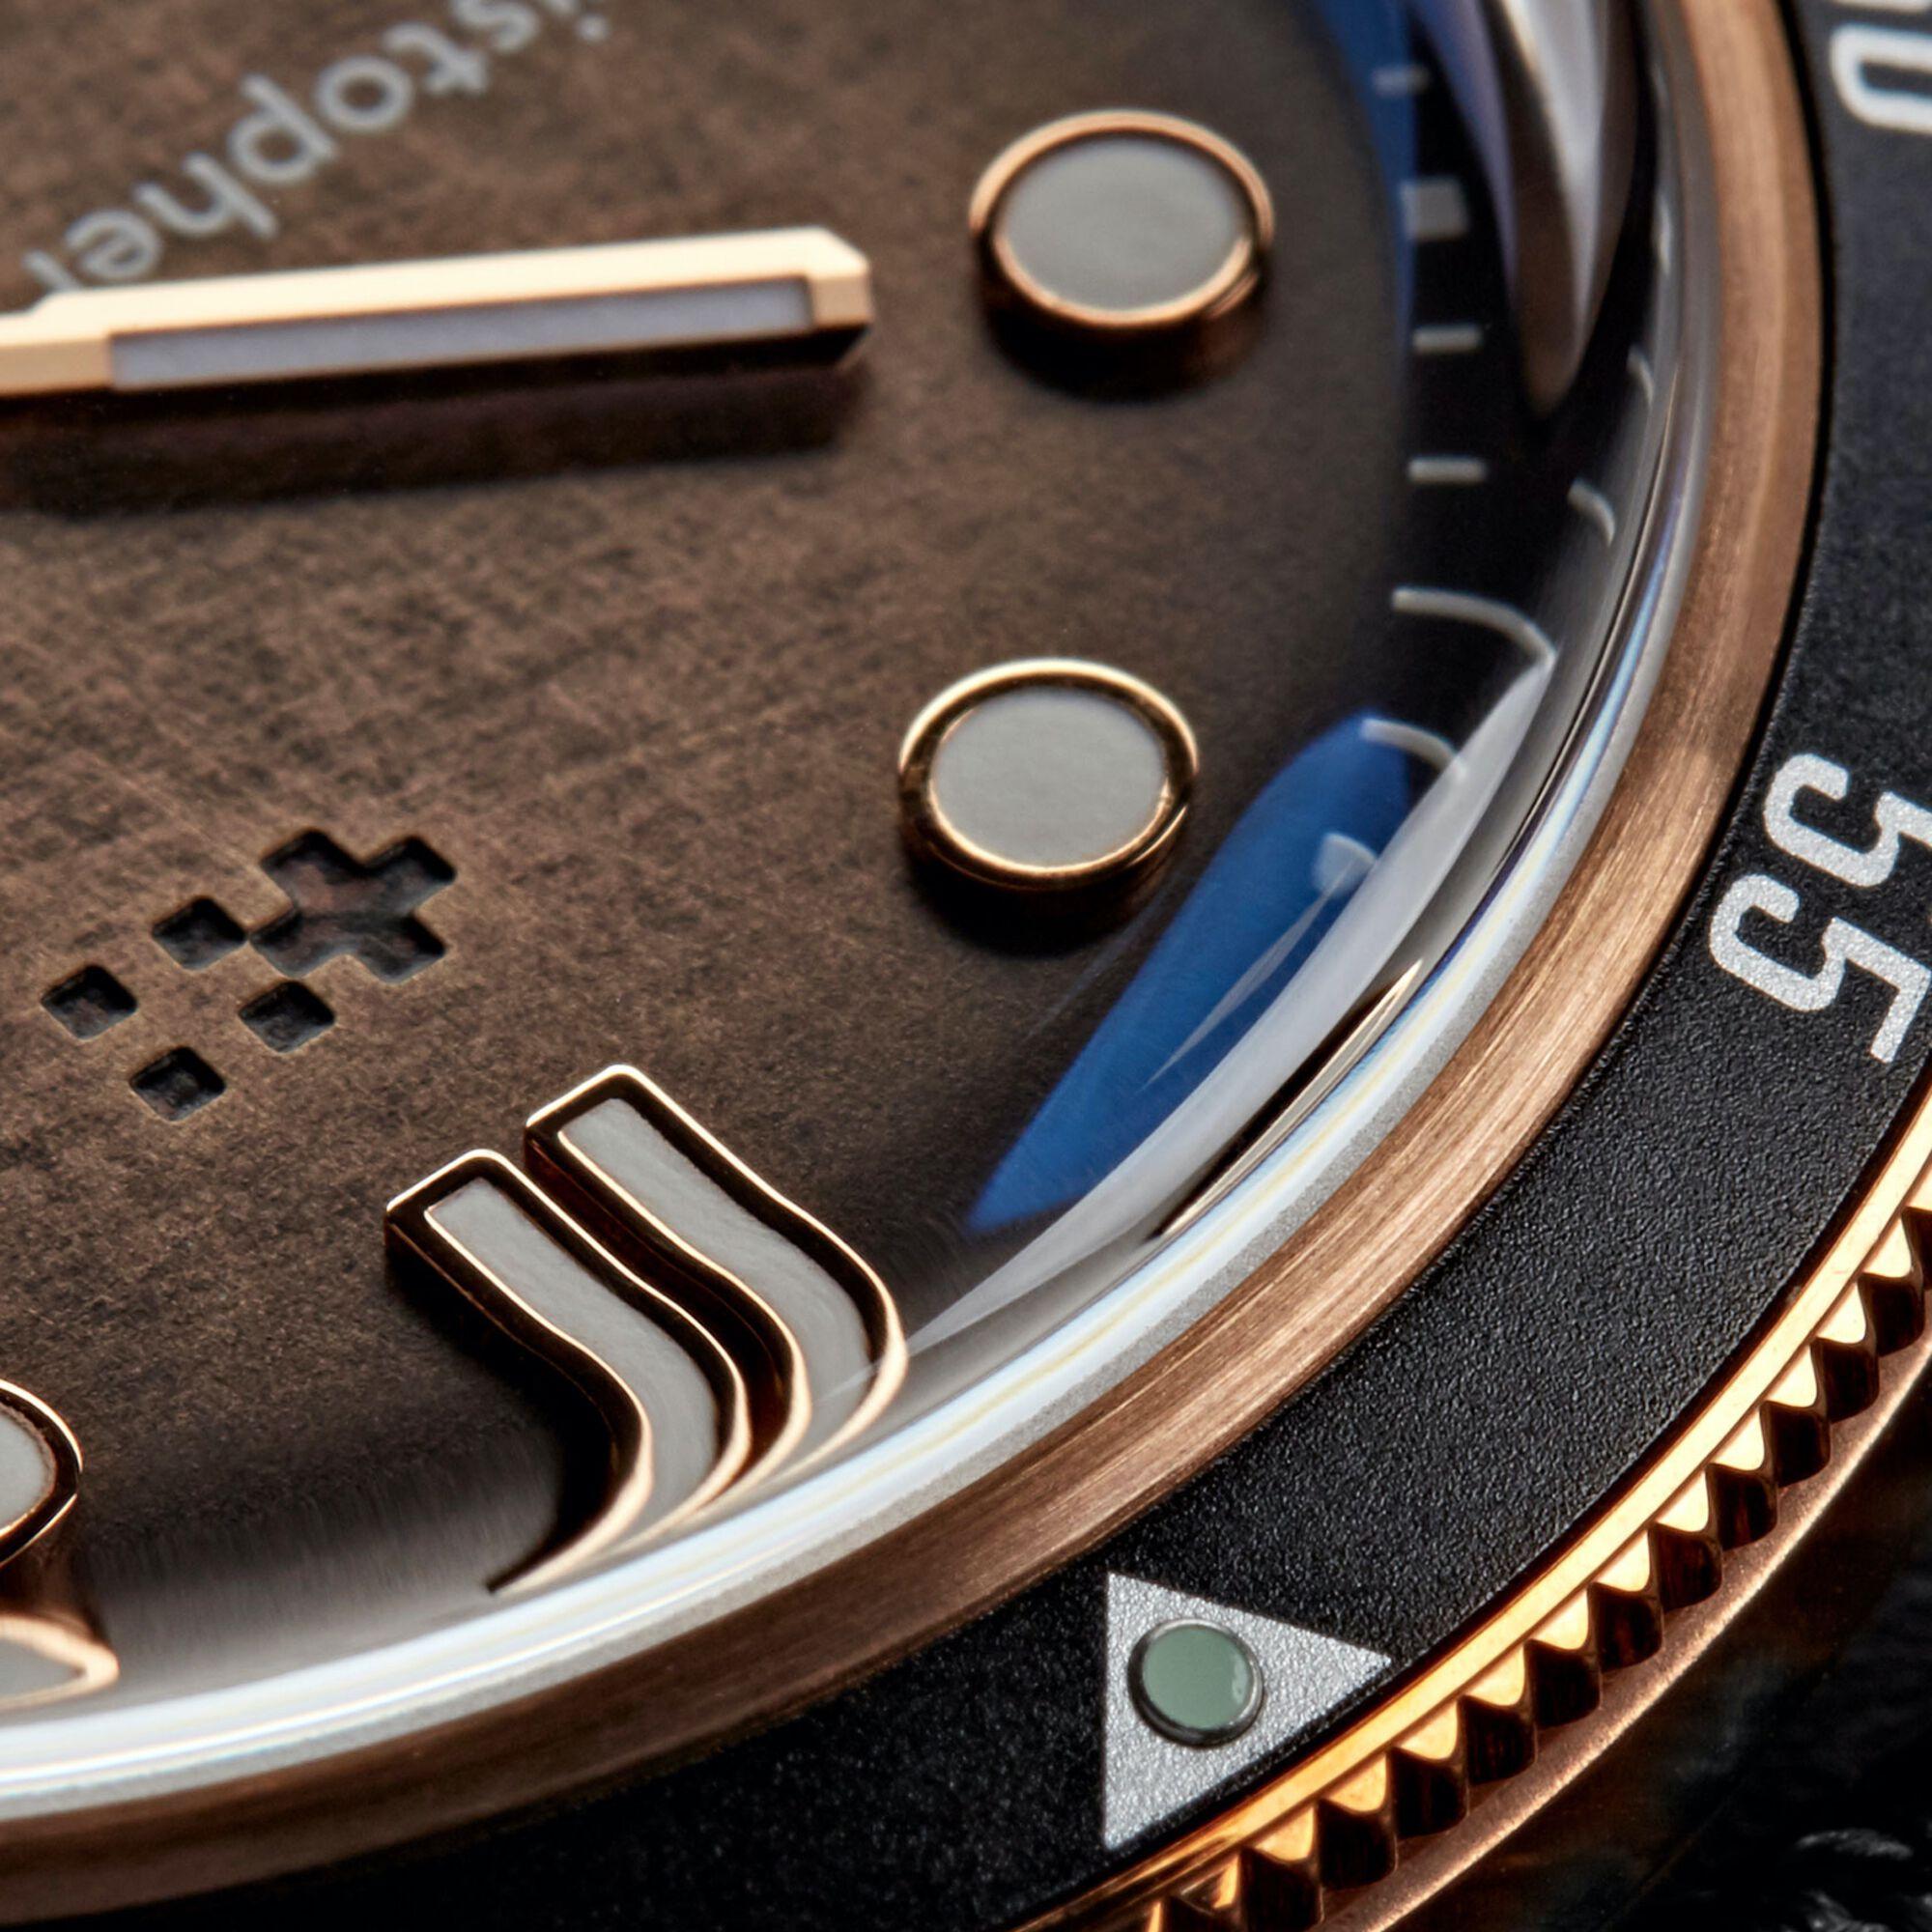 C65 Trident Bronze Ombré COSC Limited Edition